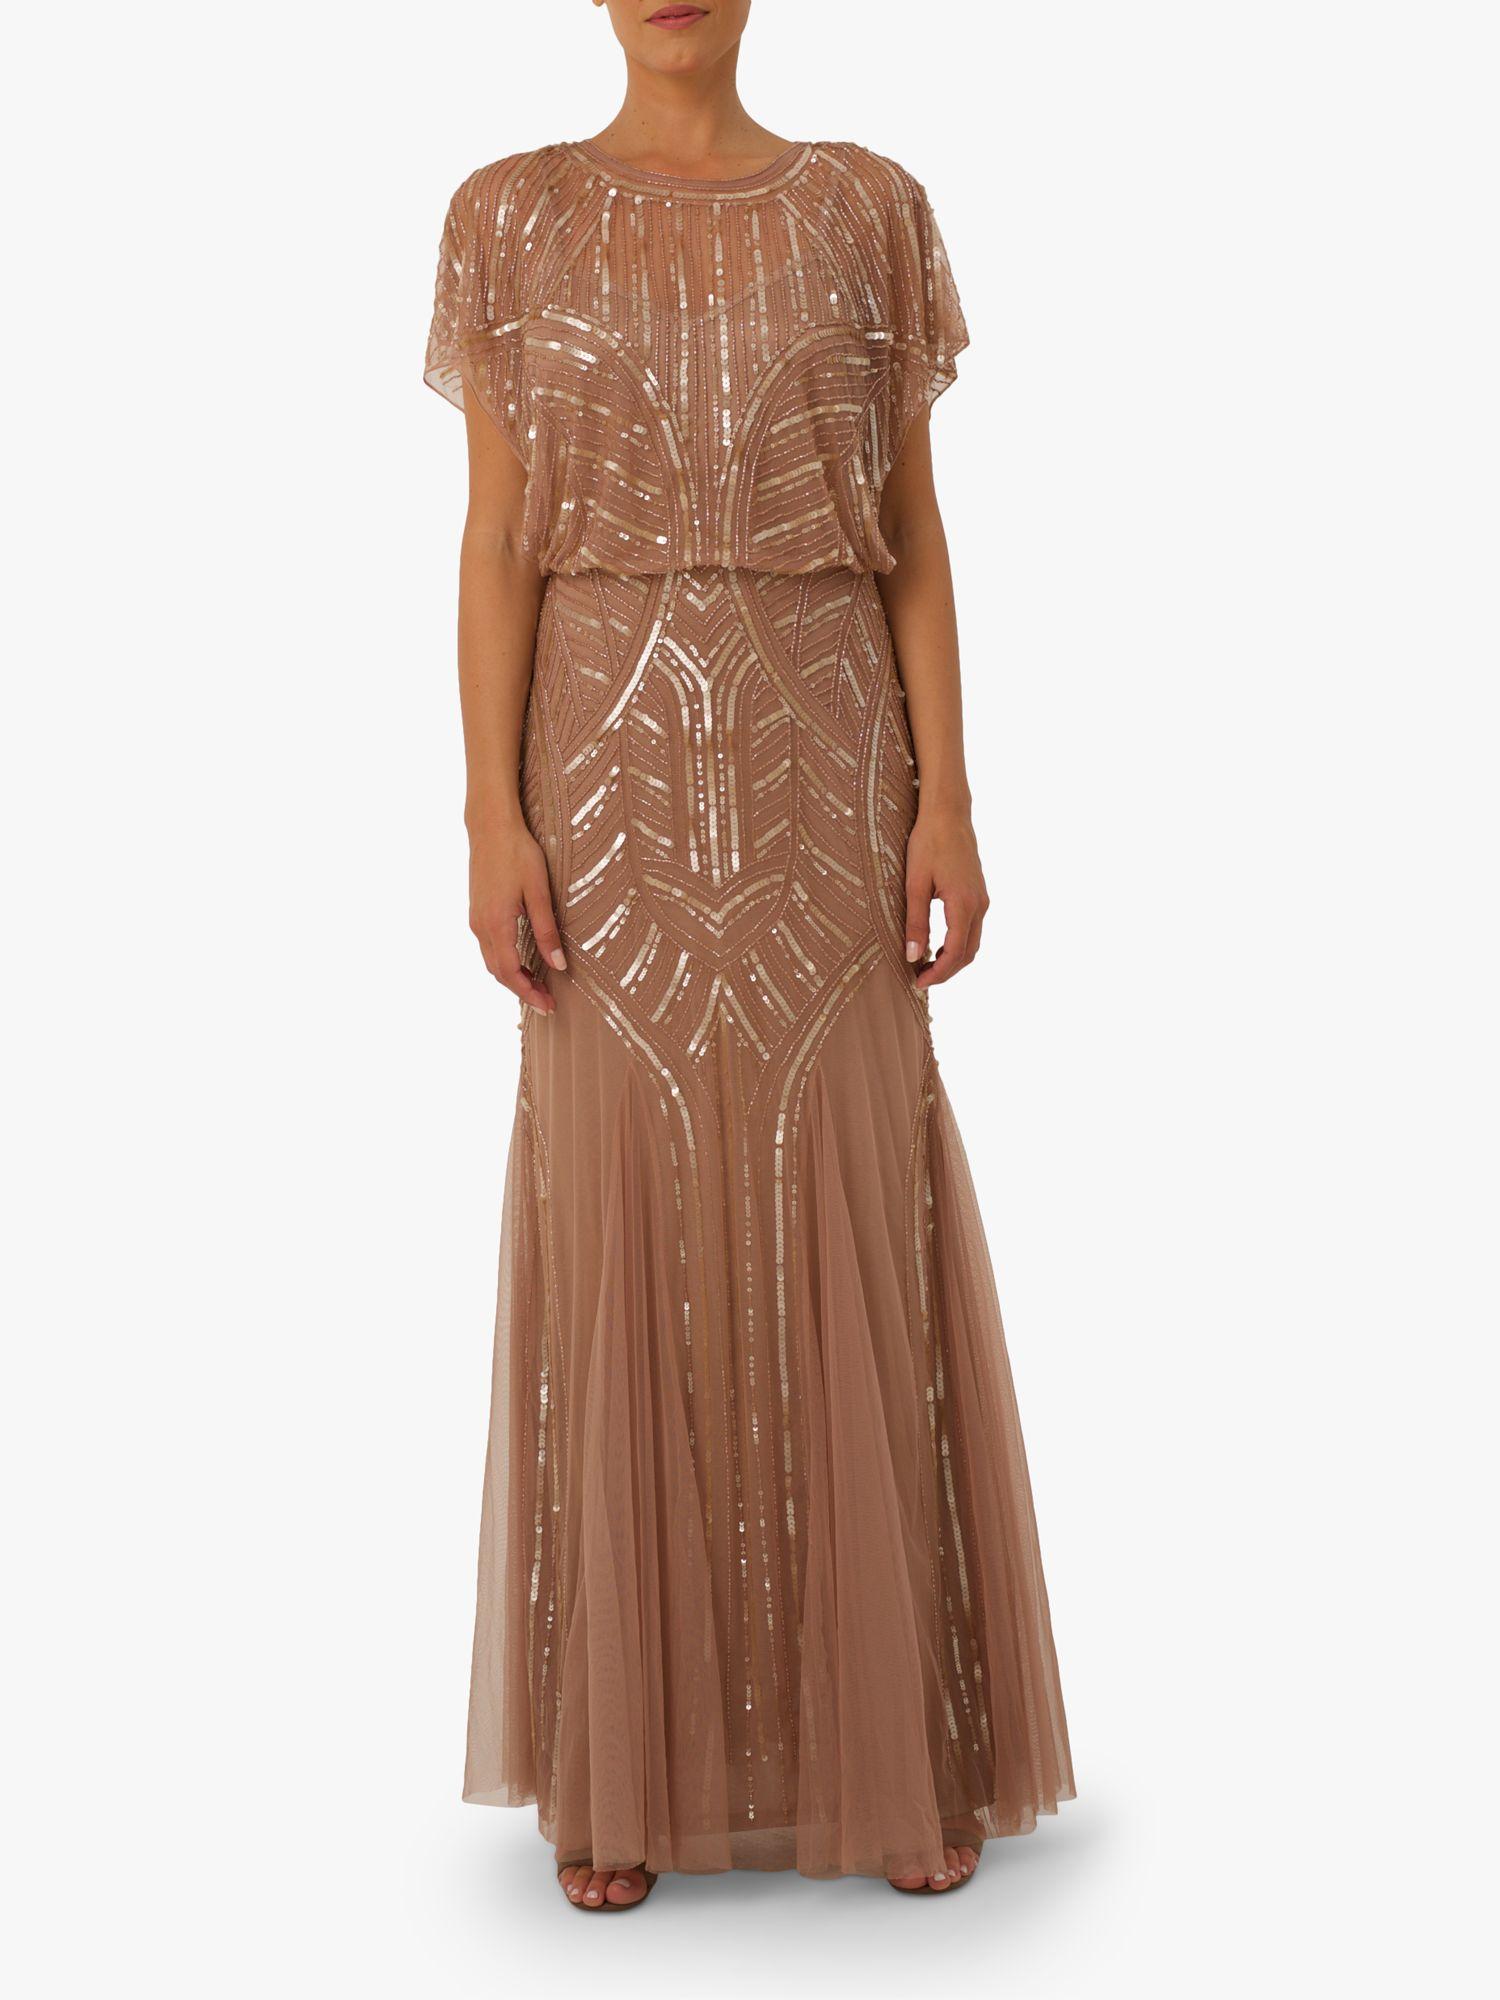 RAISHMA Raishma Rose Embellished Gown, Blush